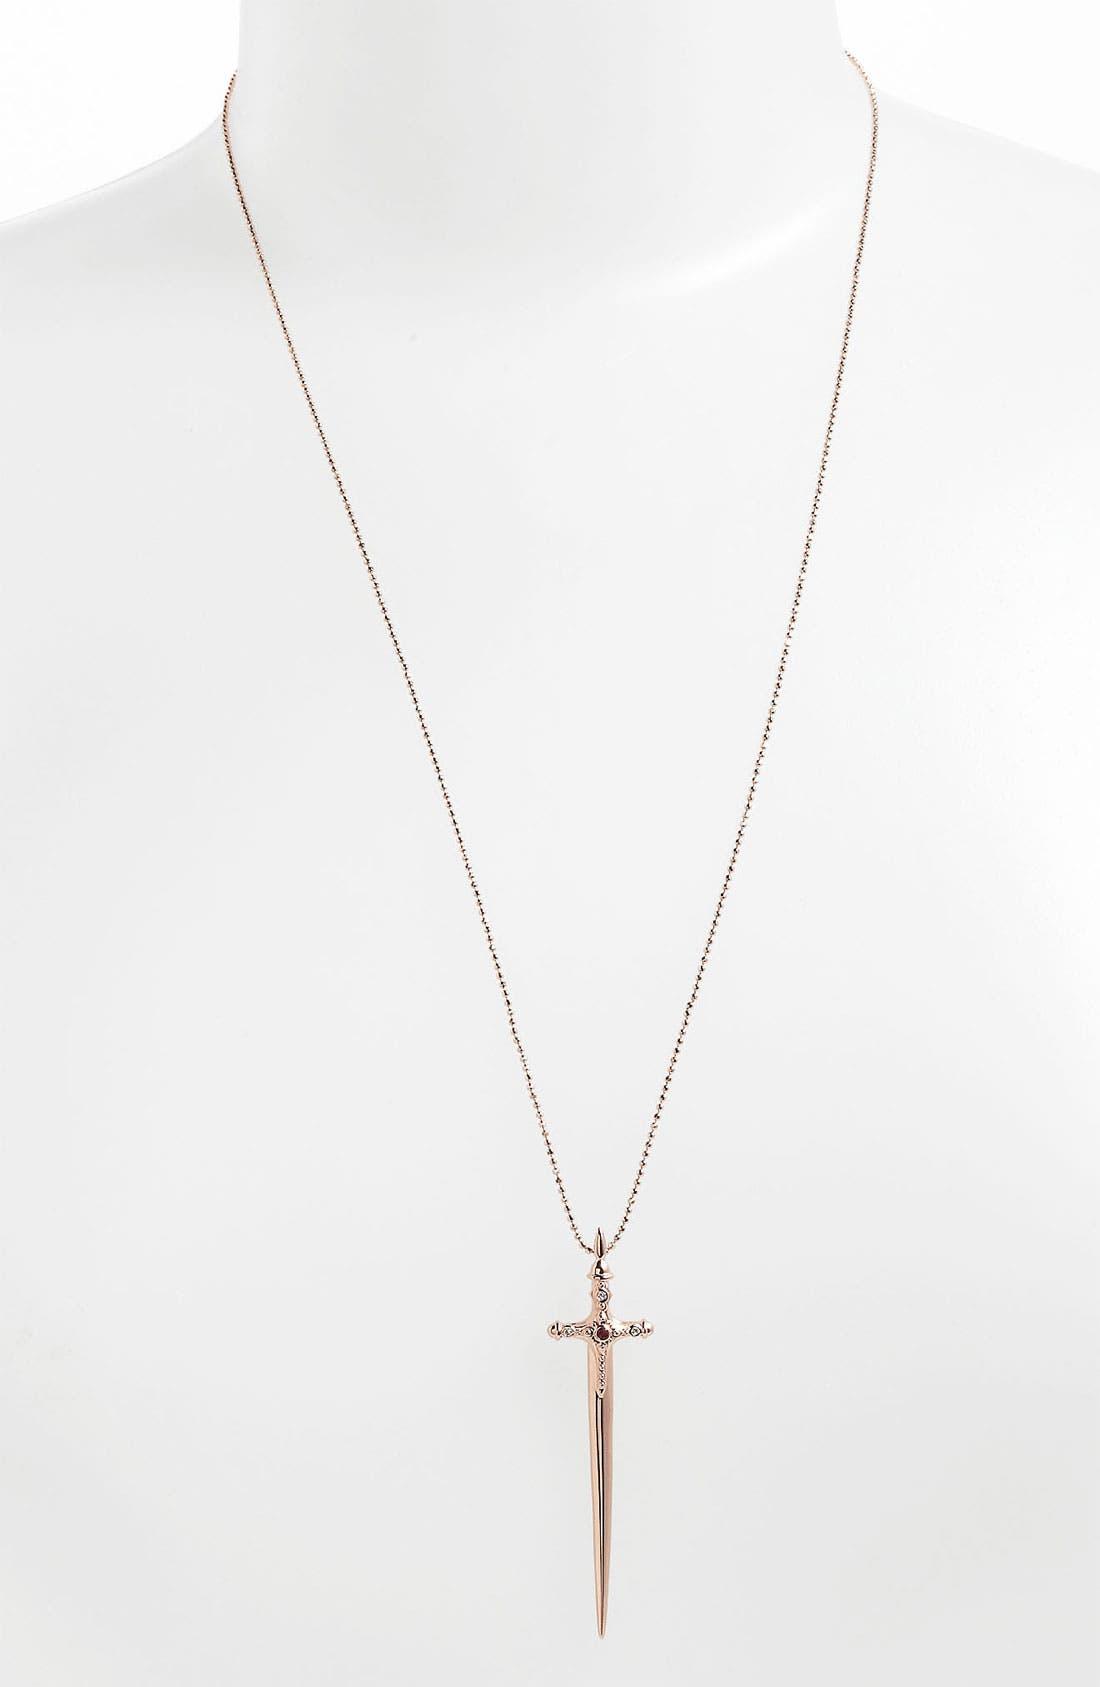 Alternate Image 1 Selected - Rachel Roy & Deepak Chopra Pendant Necklace